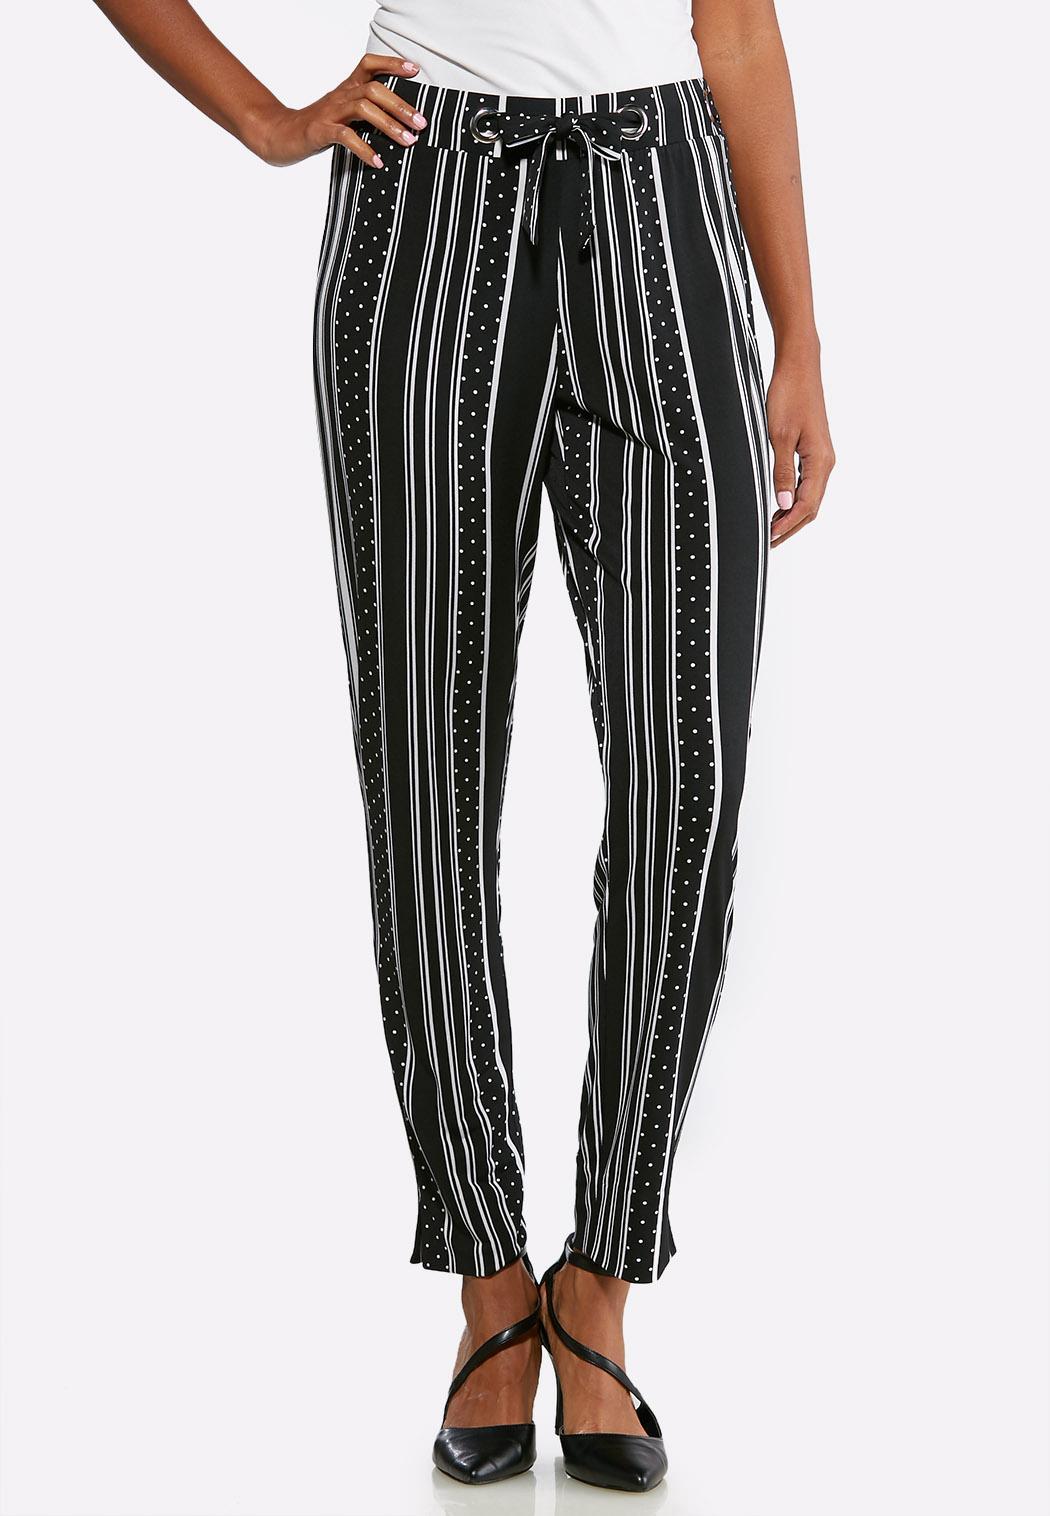 6c338b11e17 Contrast Dotted Stripe Pants alternate view · Contrast Dotted Stripe Pants